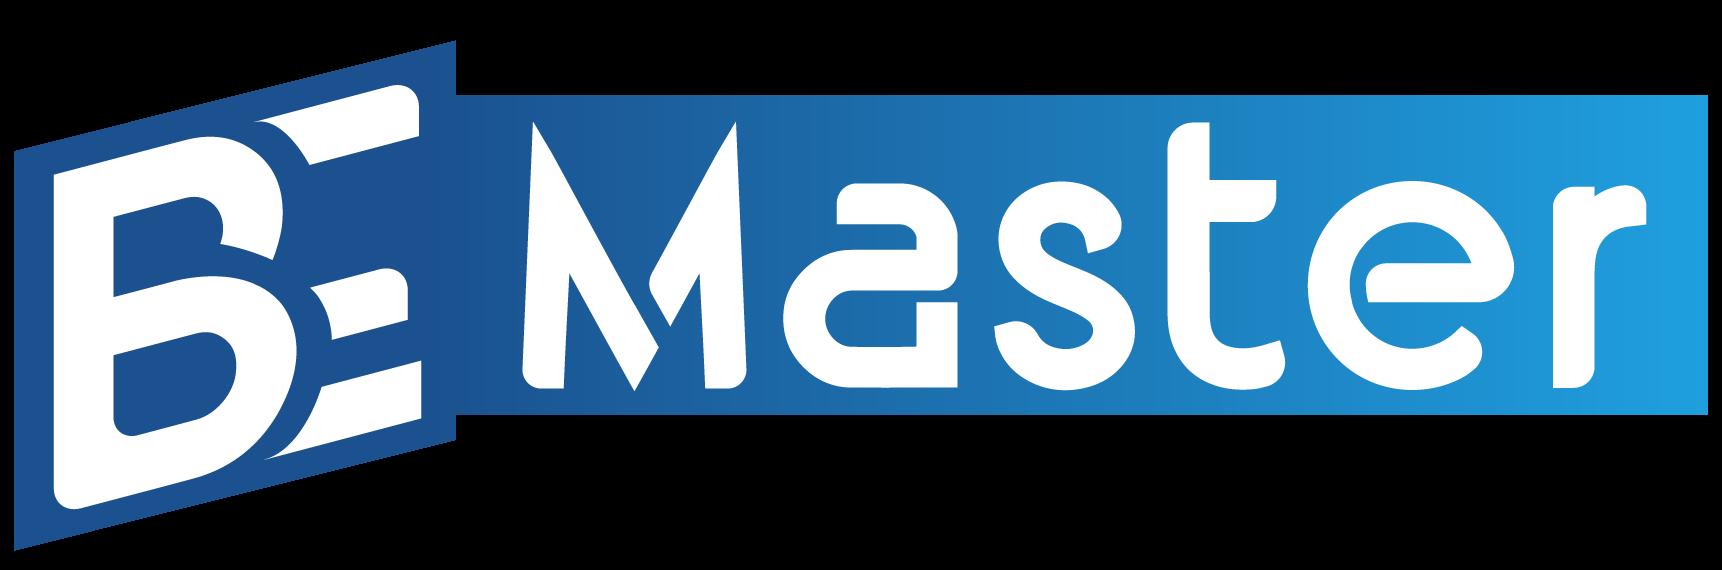 Logo Bemaster